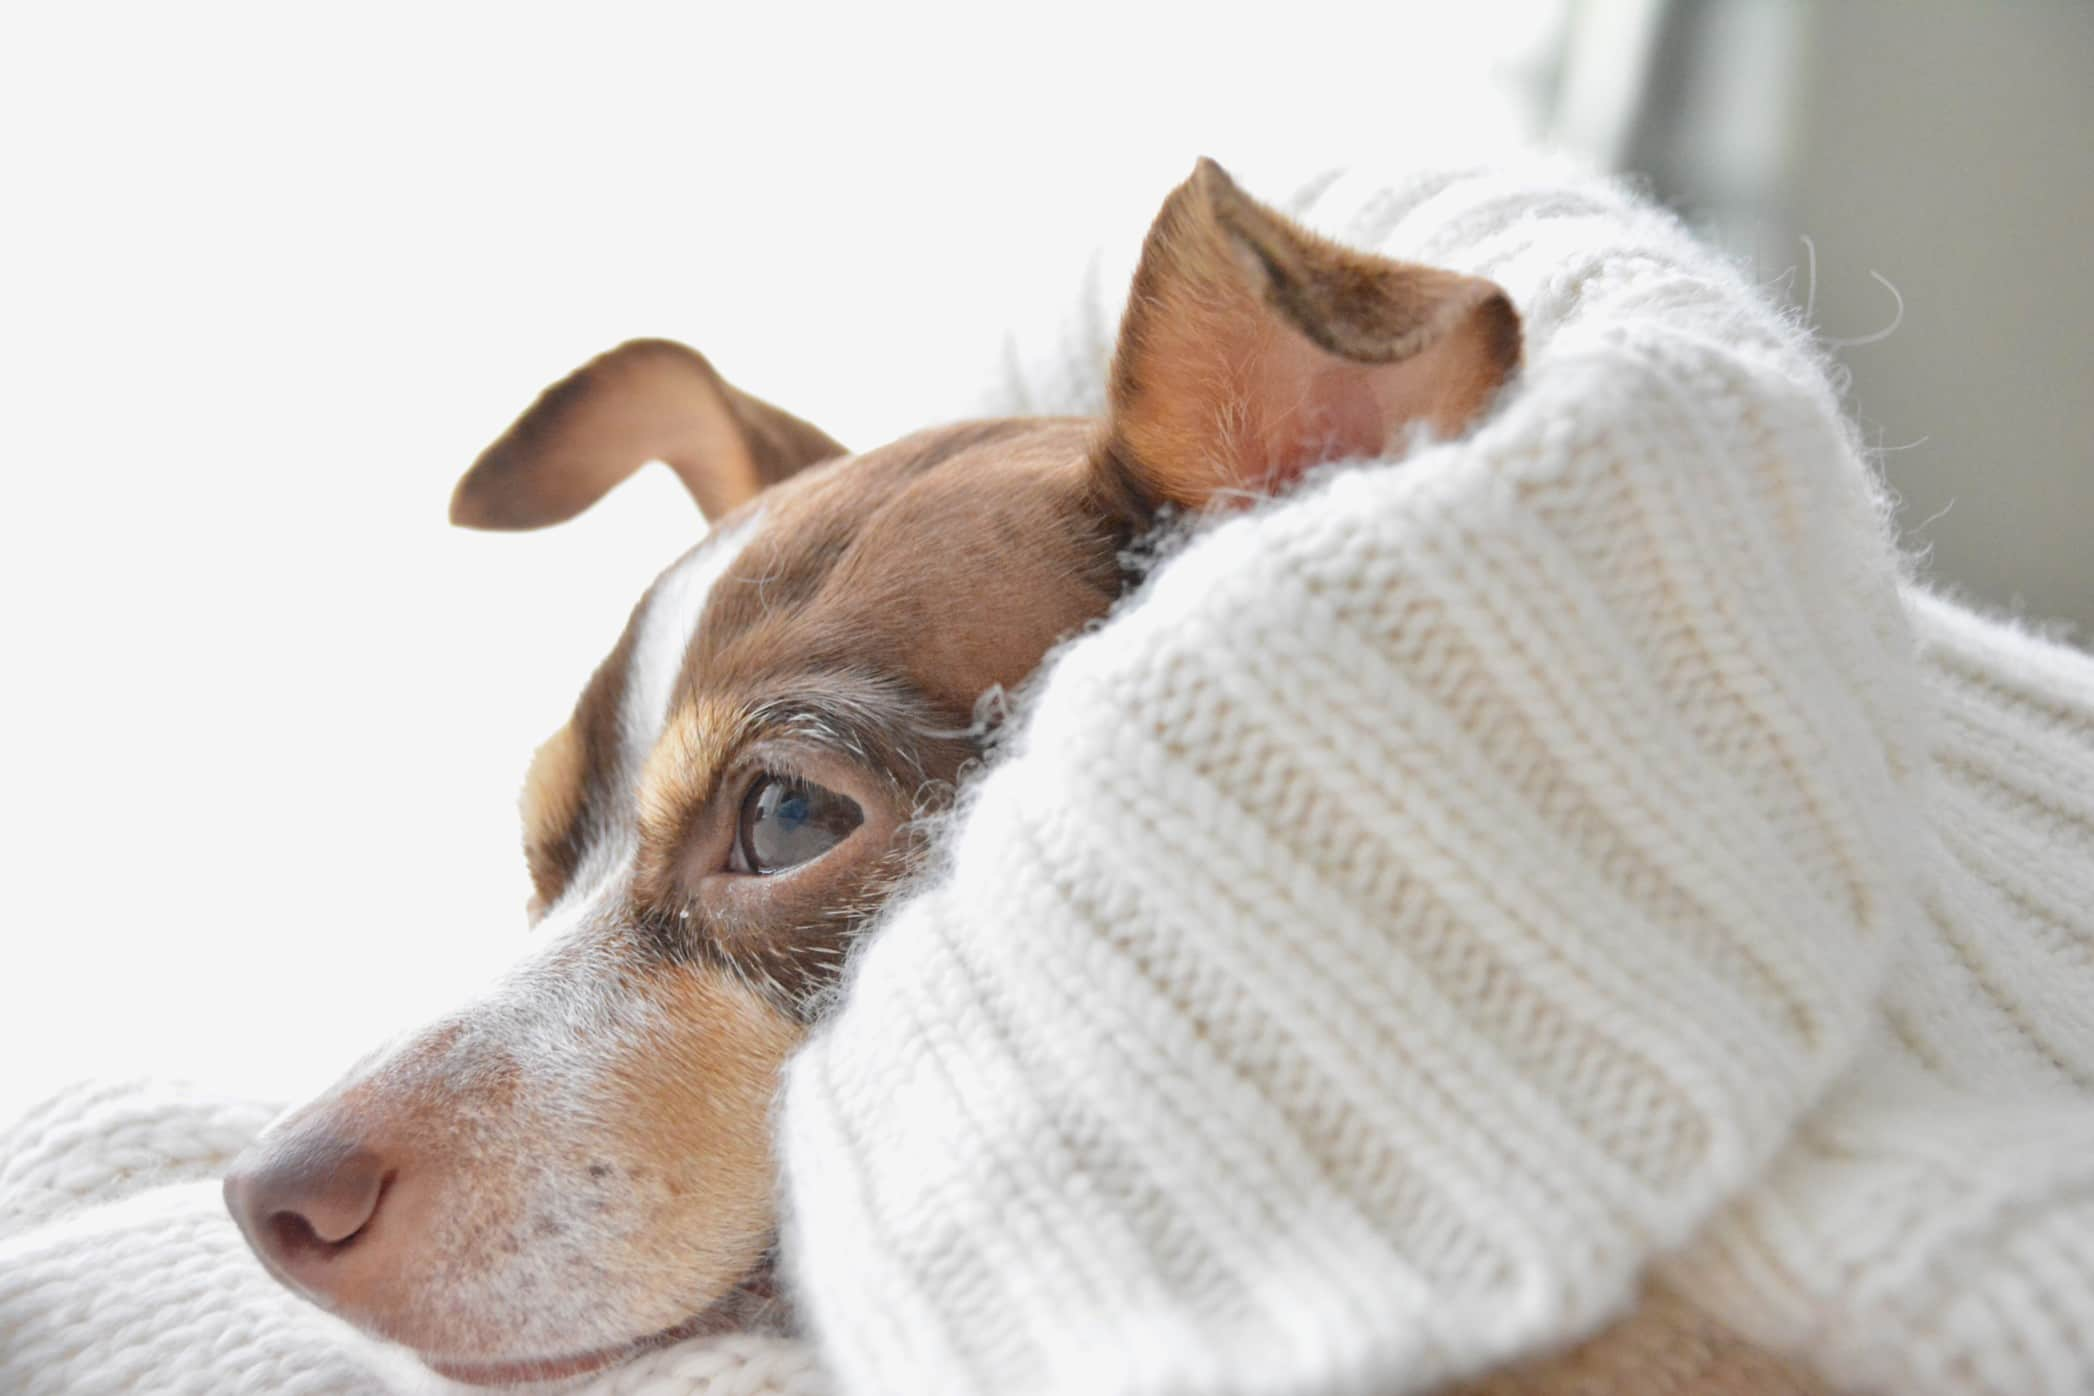 DOGS Archives - Dandelion Chandelier